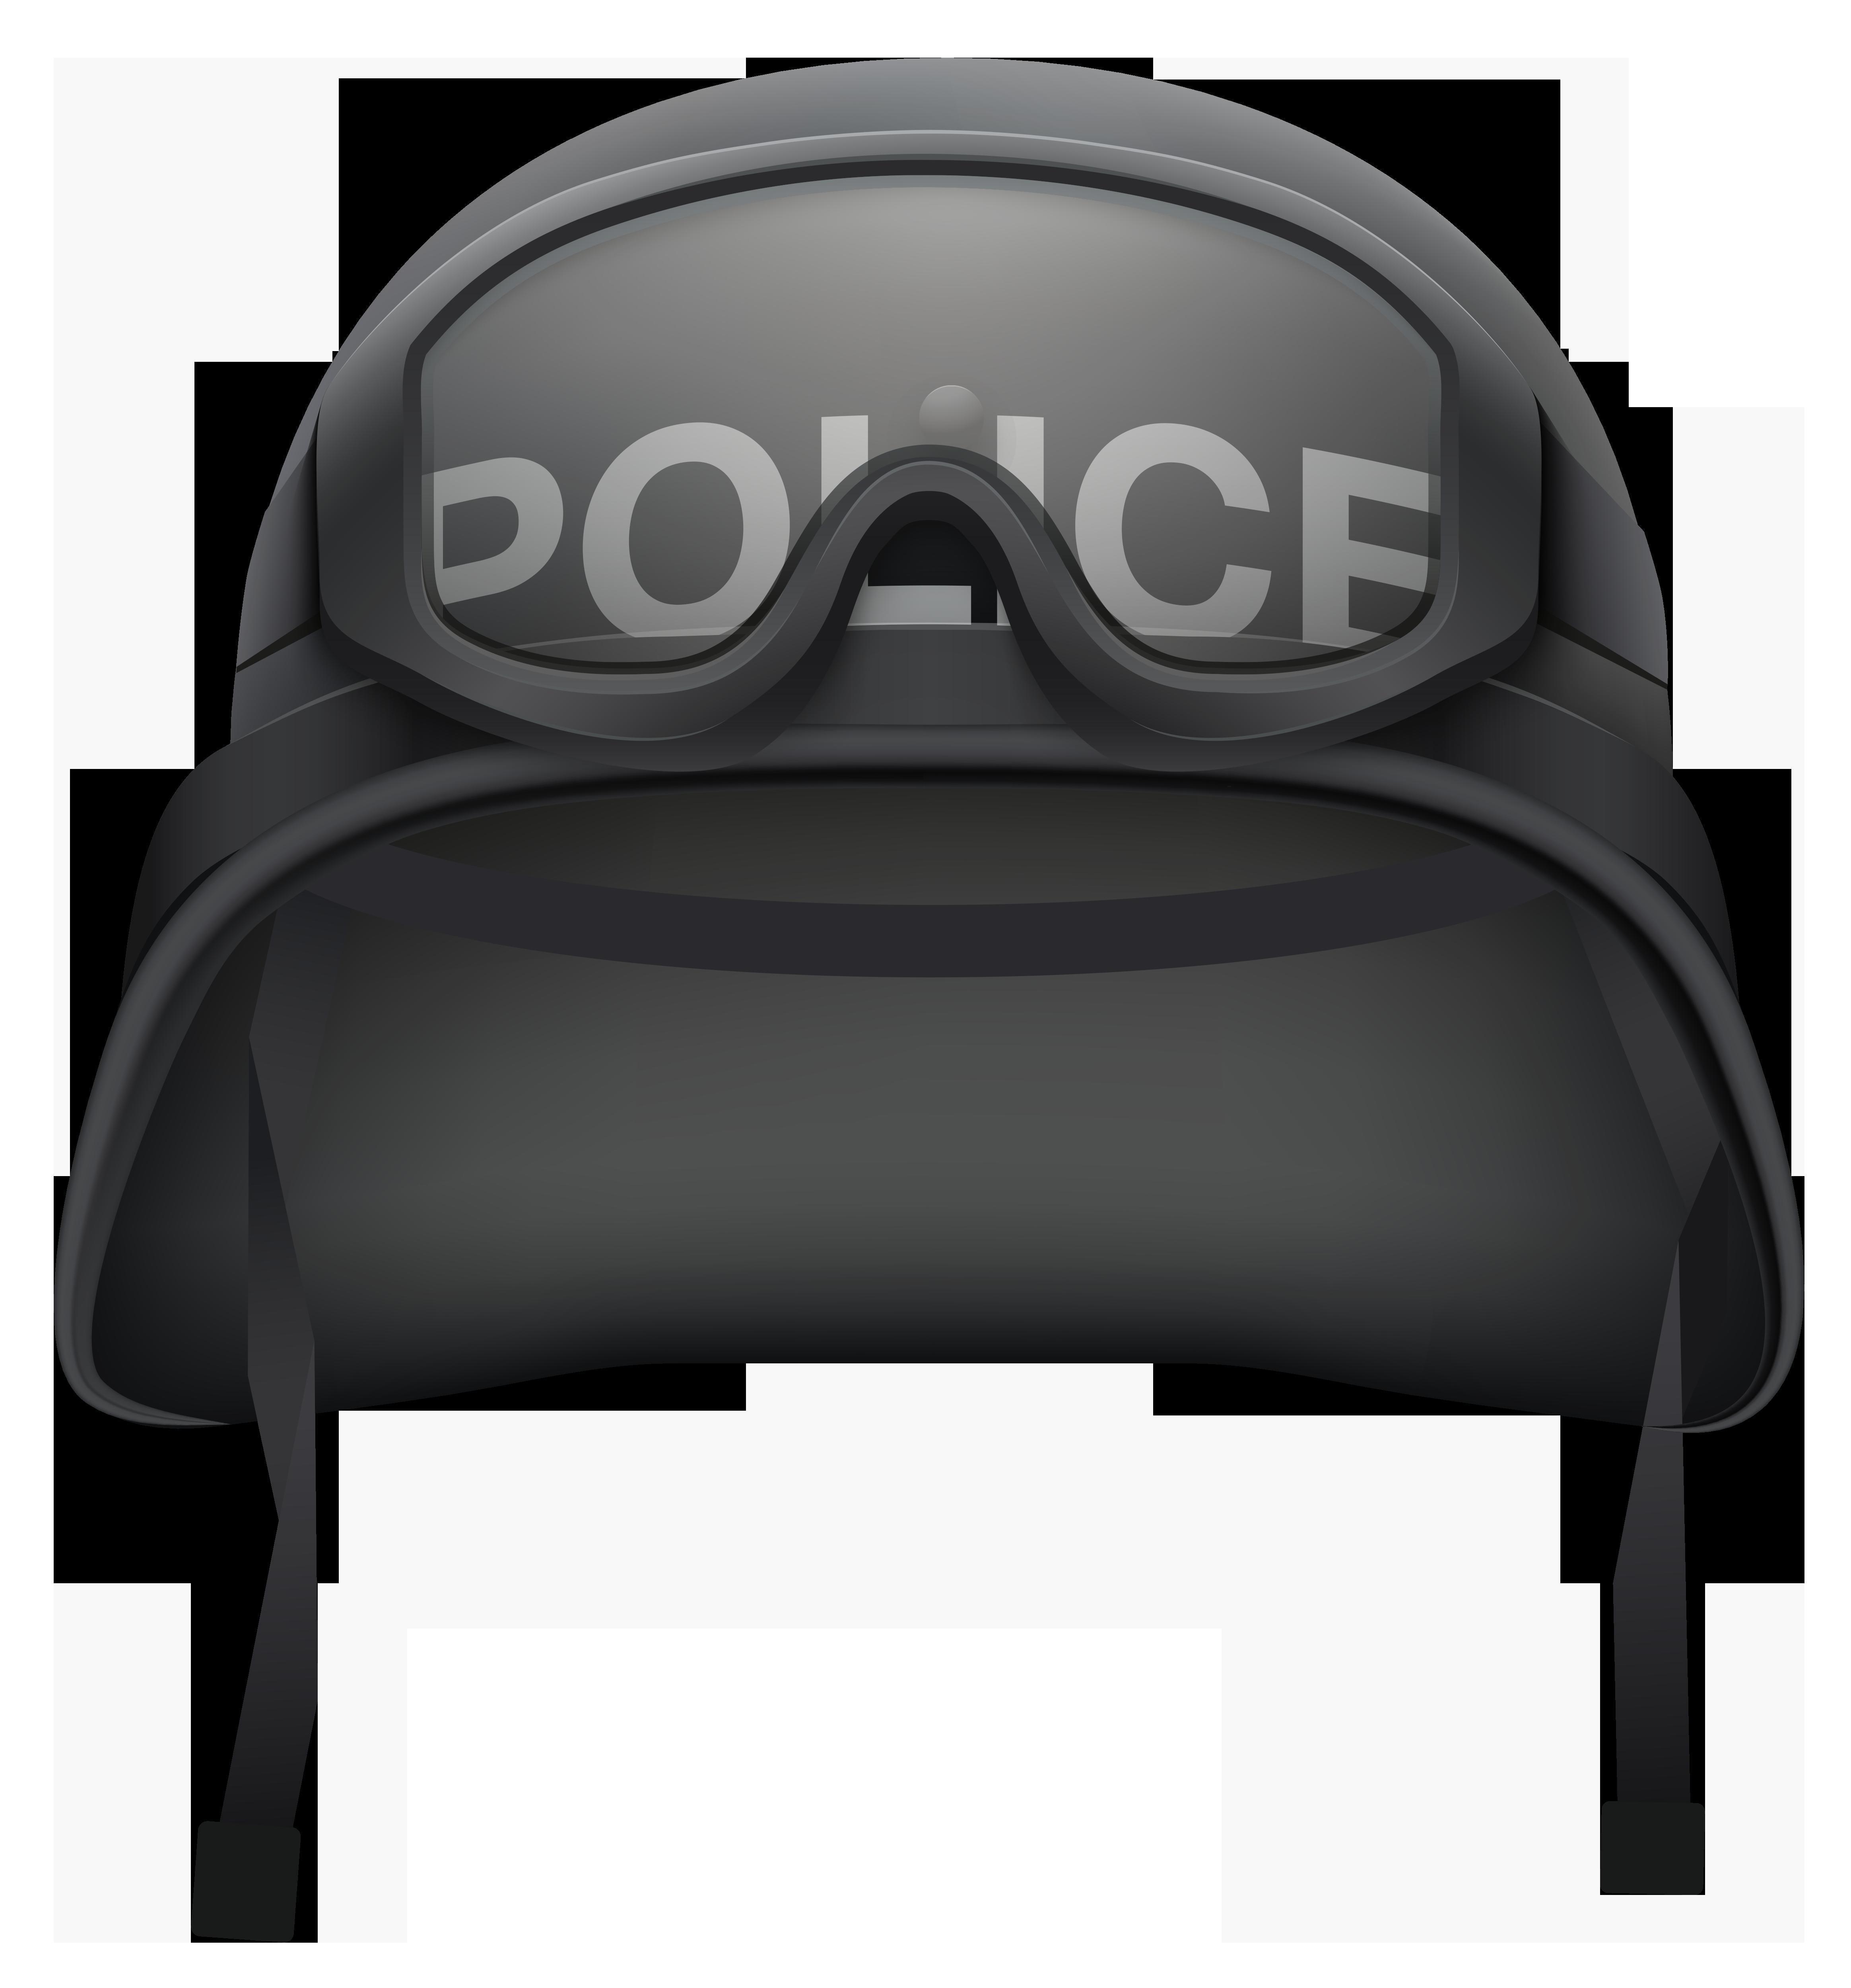 Motorcycle clipart police officer. Helmet custodian riot png